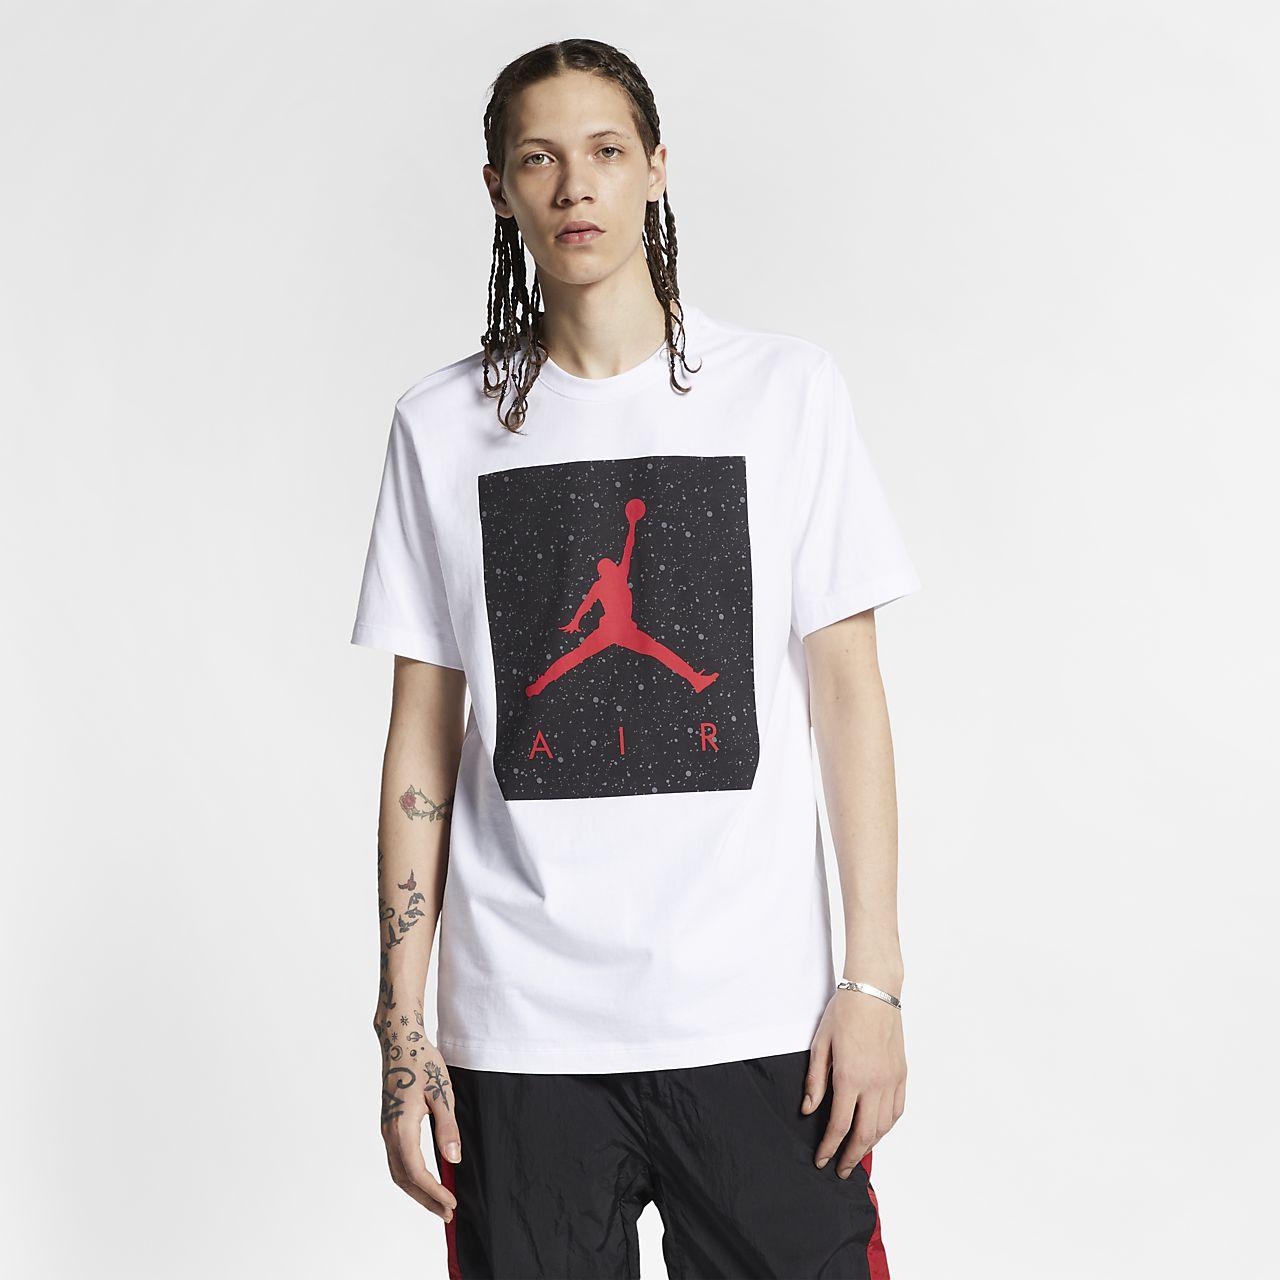 Jordan Poolside Camiseta - Hombre